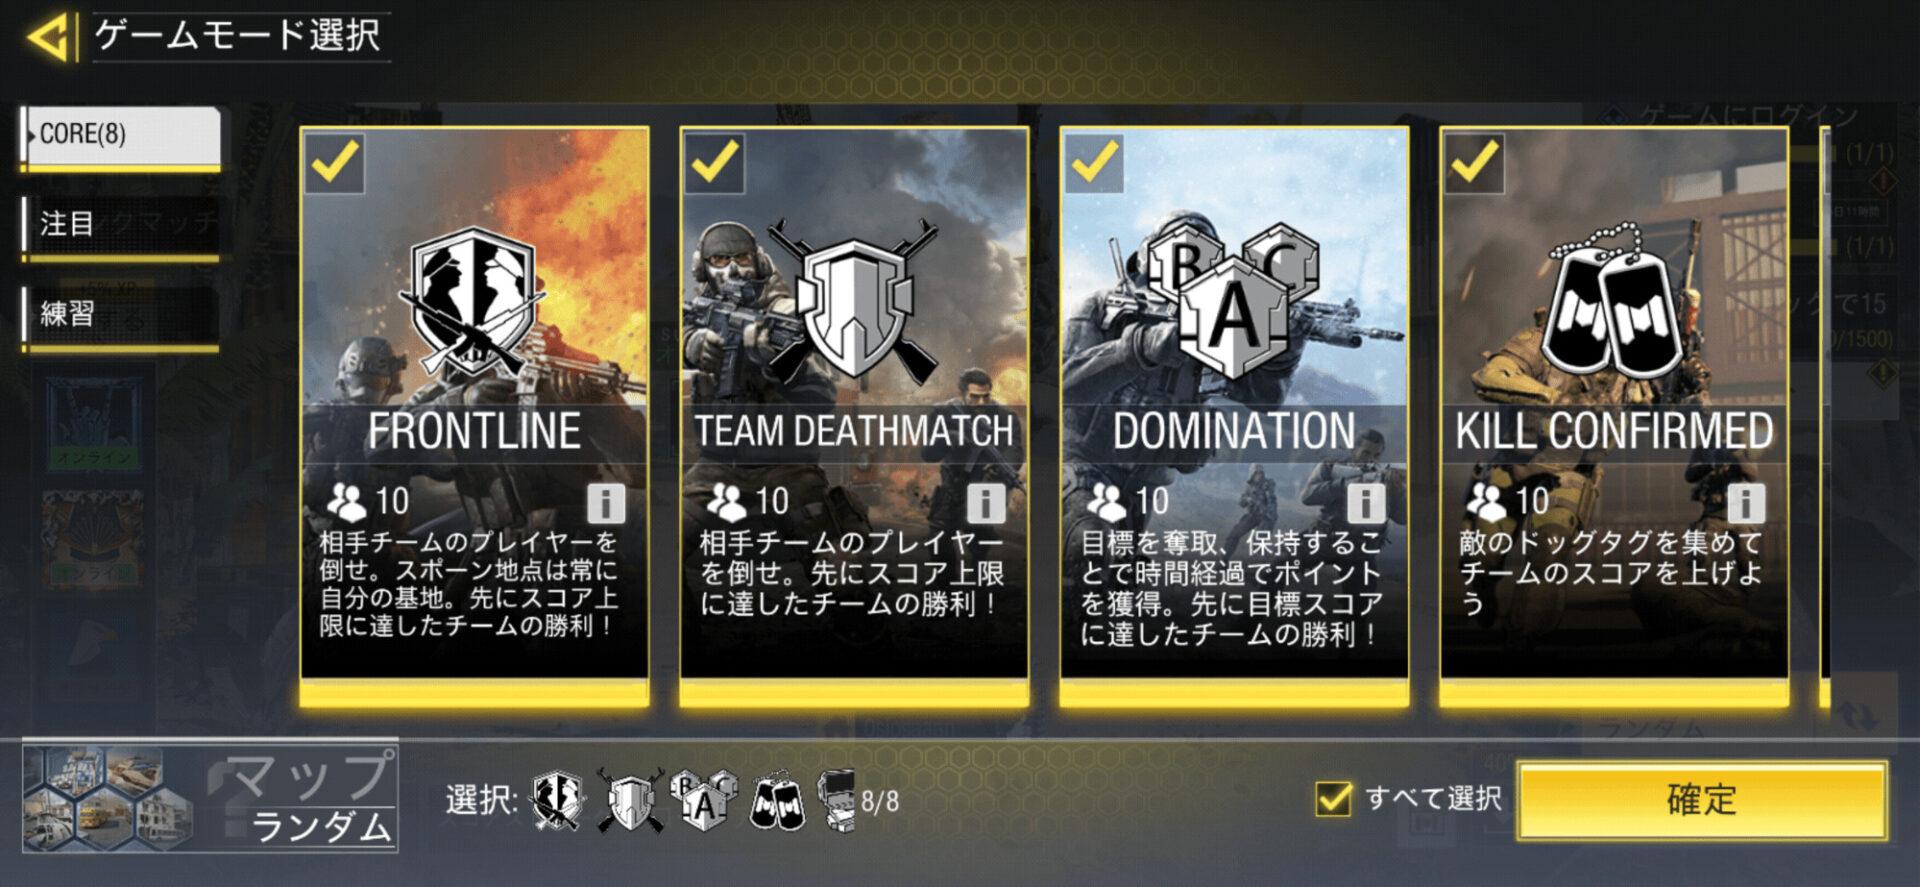 Call of Duty®: Mobileのマルチプレイ画面でゲームモードを選んでいる様子